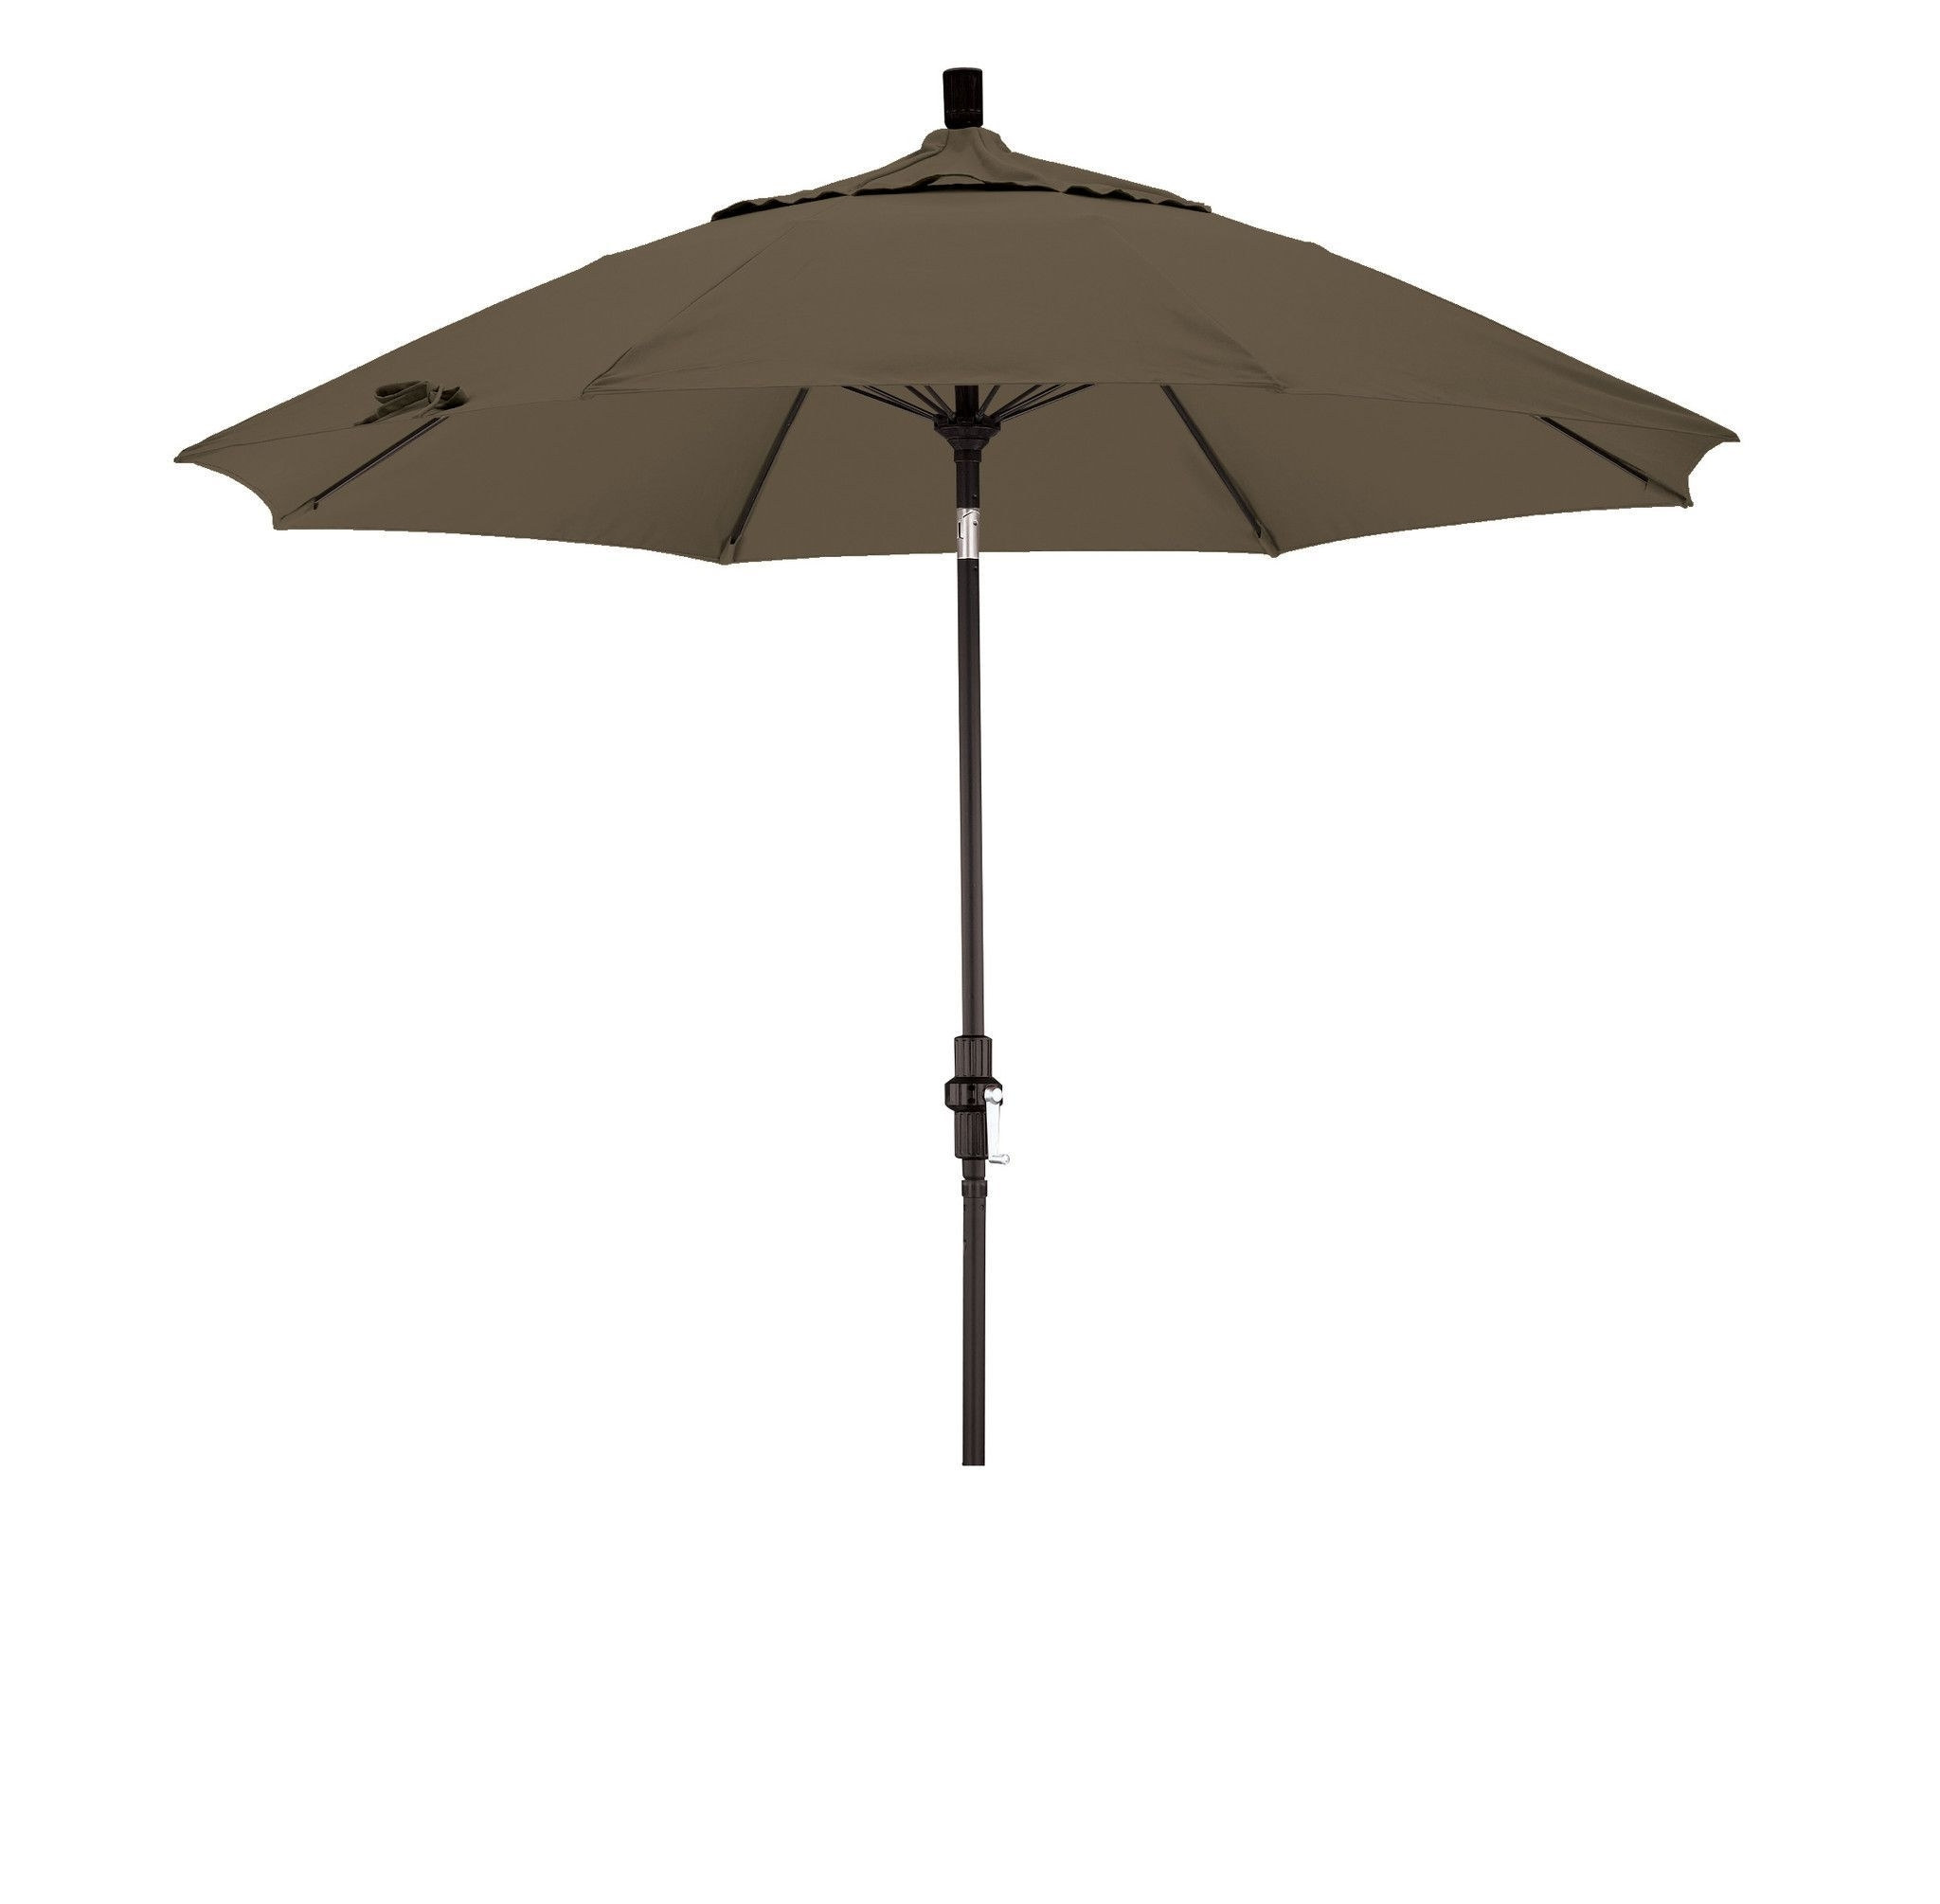 Widely Used Sunbrella Teak Umbrellas For Eclipse Collection 9' Fiberglass Market Umbrella Collar Tilt M Black (View 6 of 20)